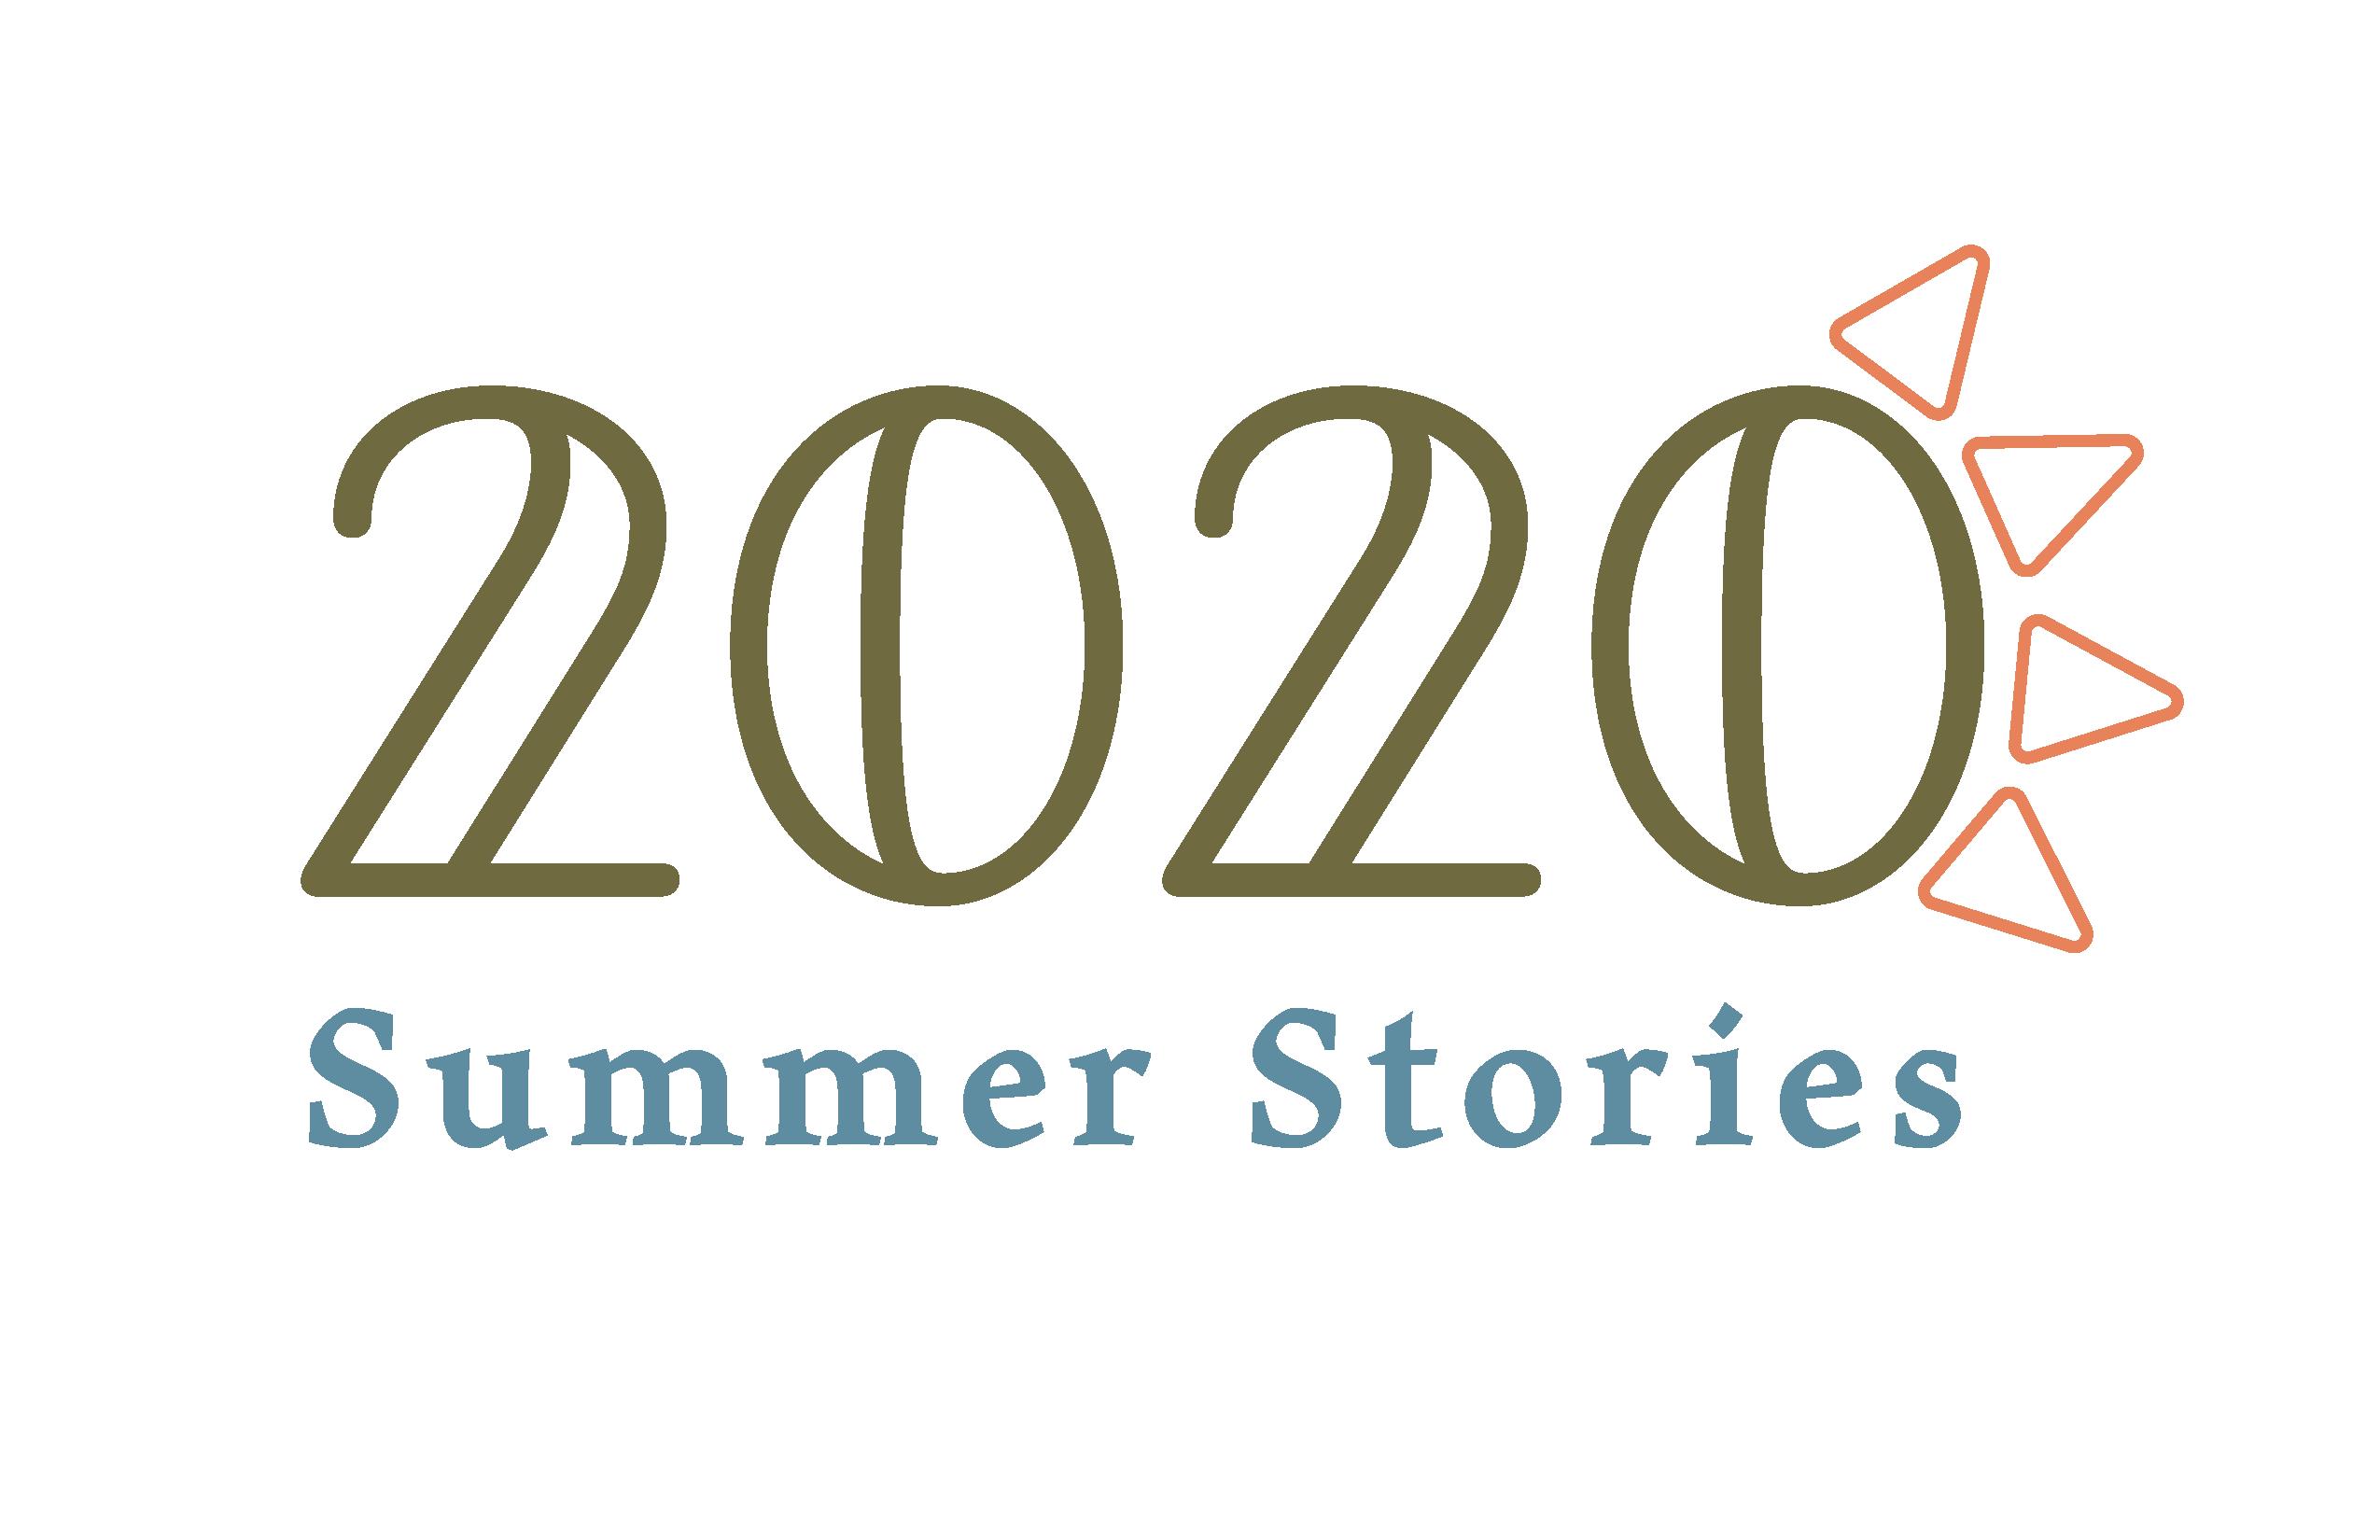 2020 Summer Stories